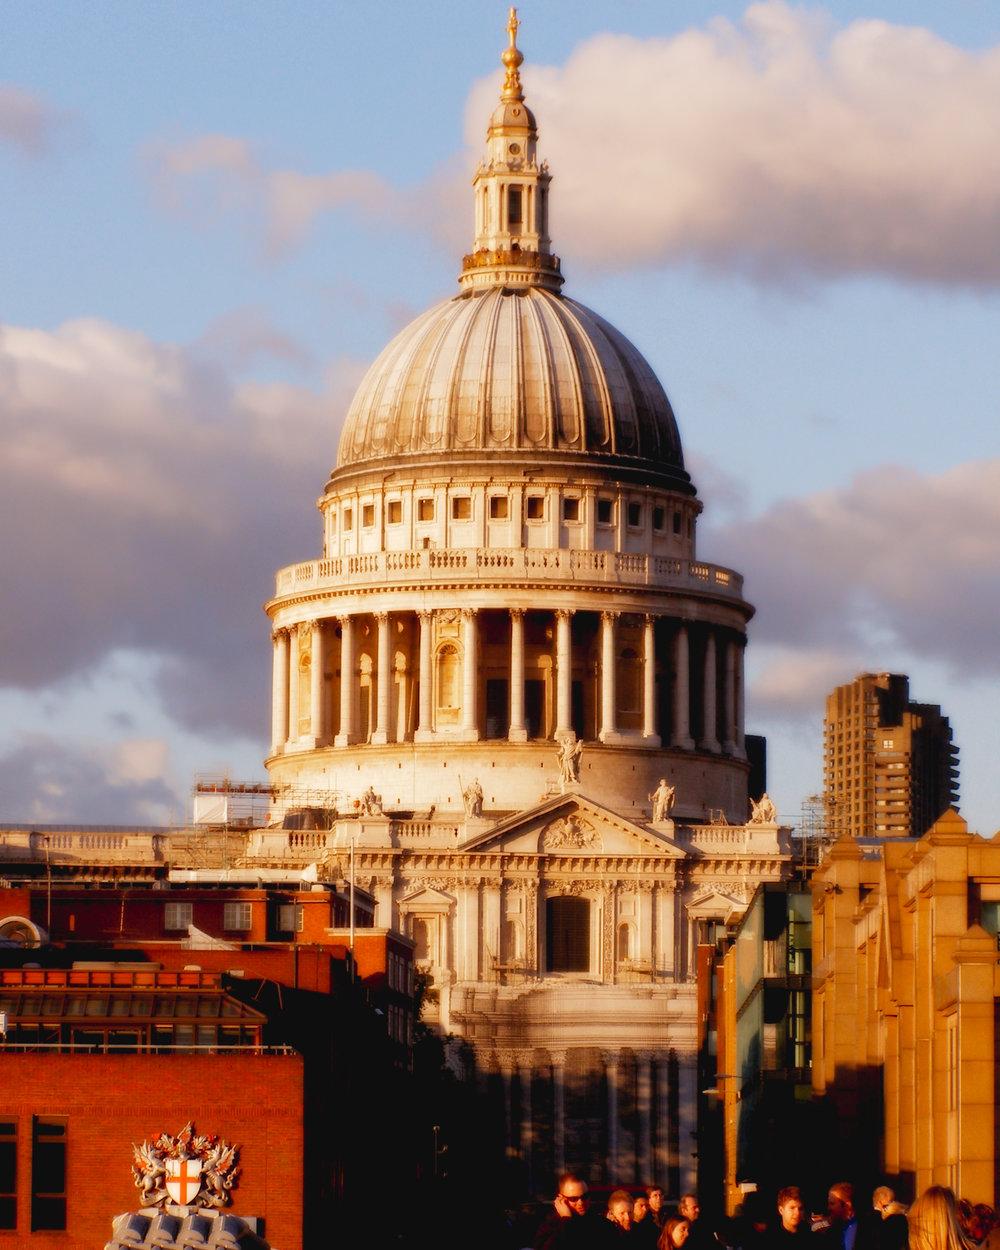 This Cool Building-London-England-wmlamont_5PB020148b.jpg